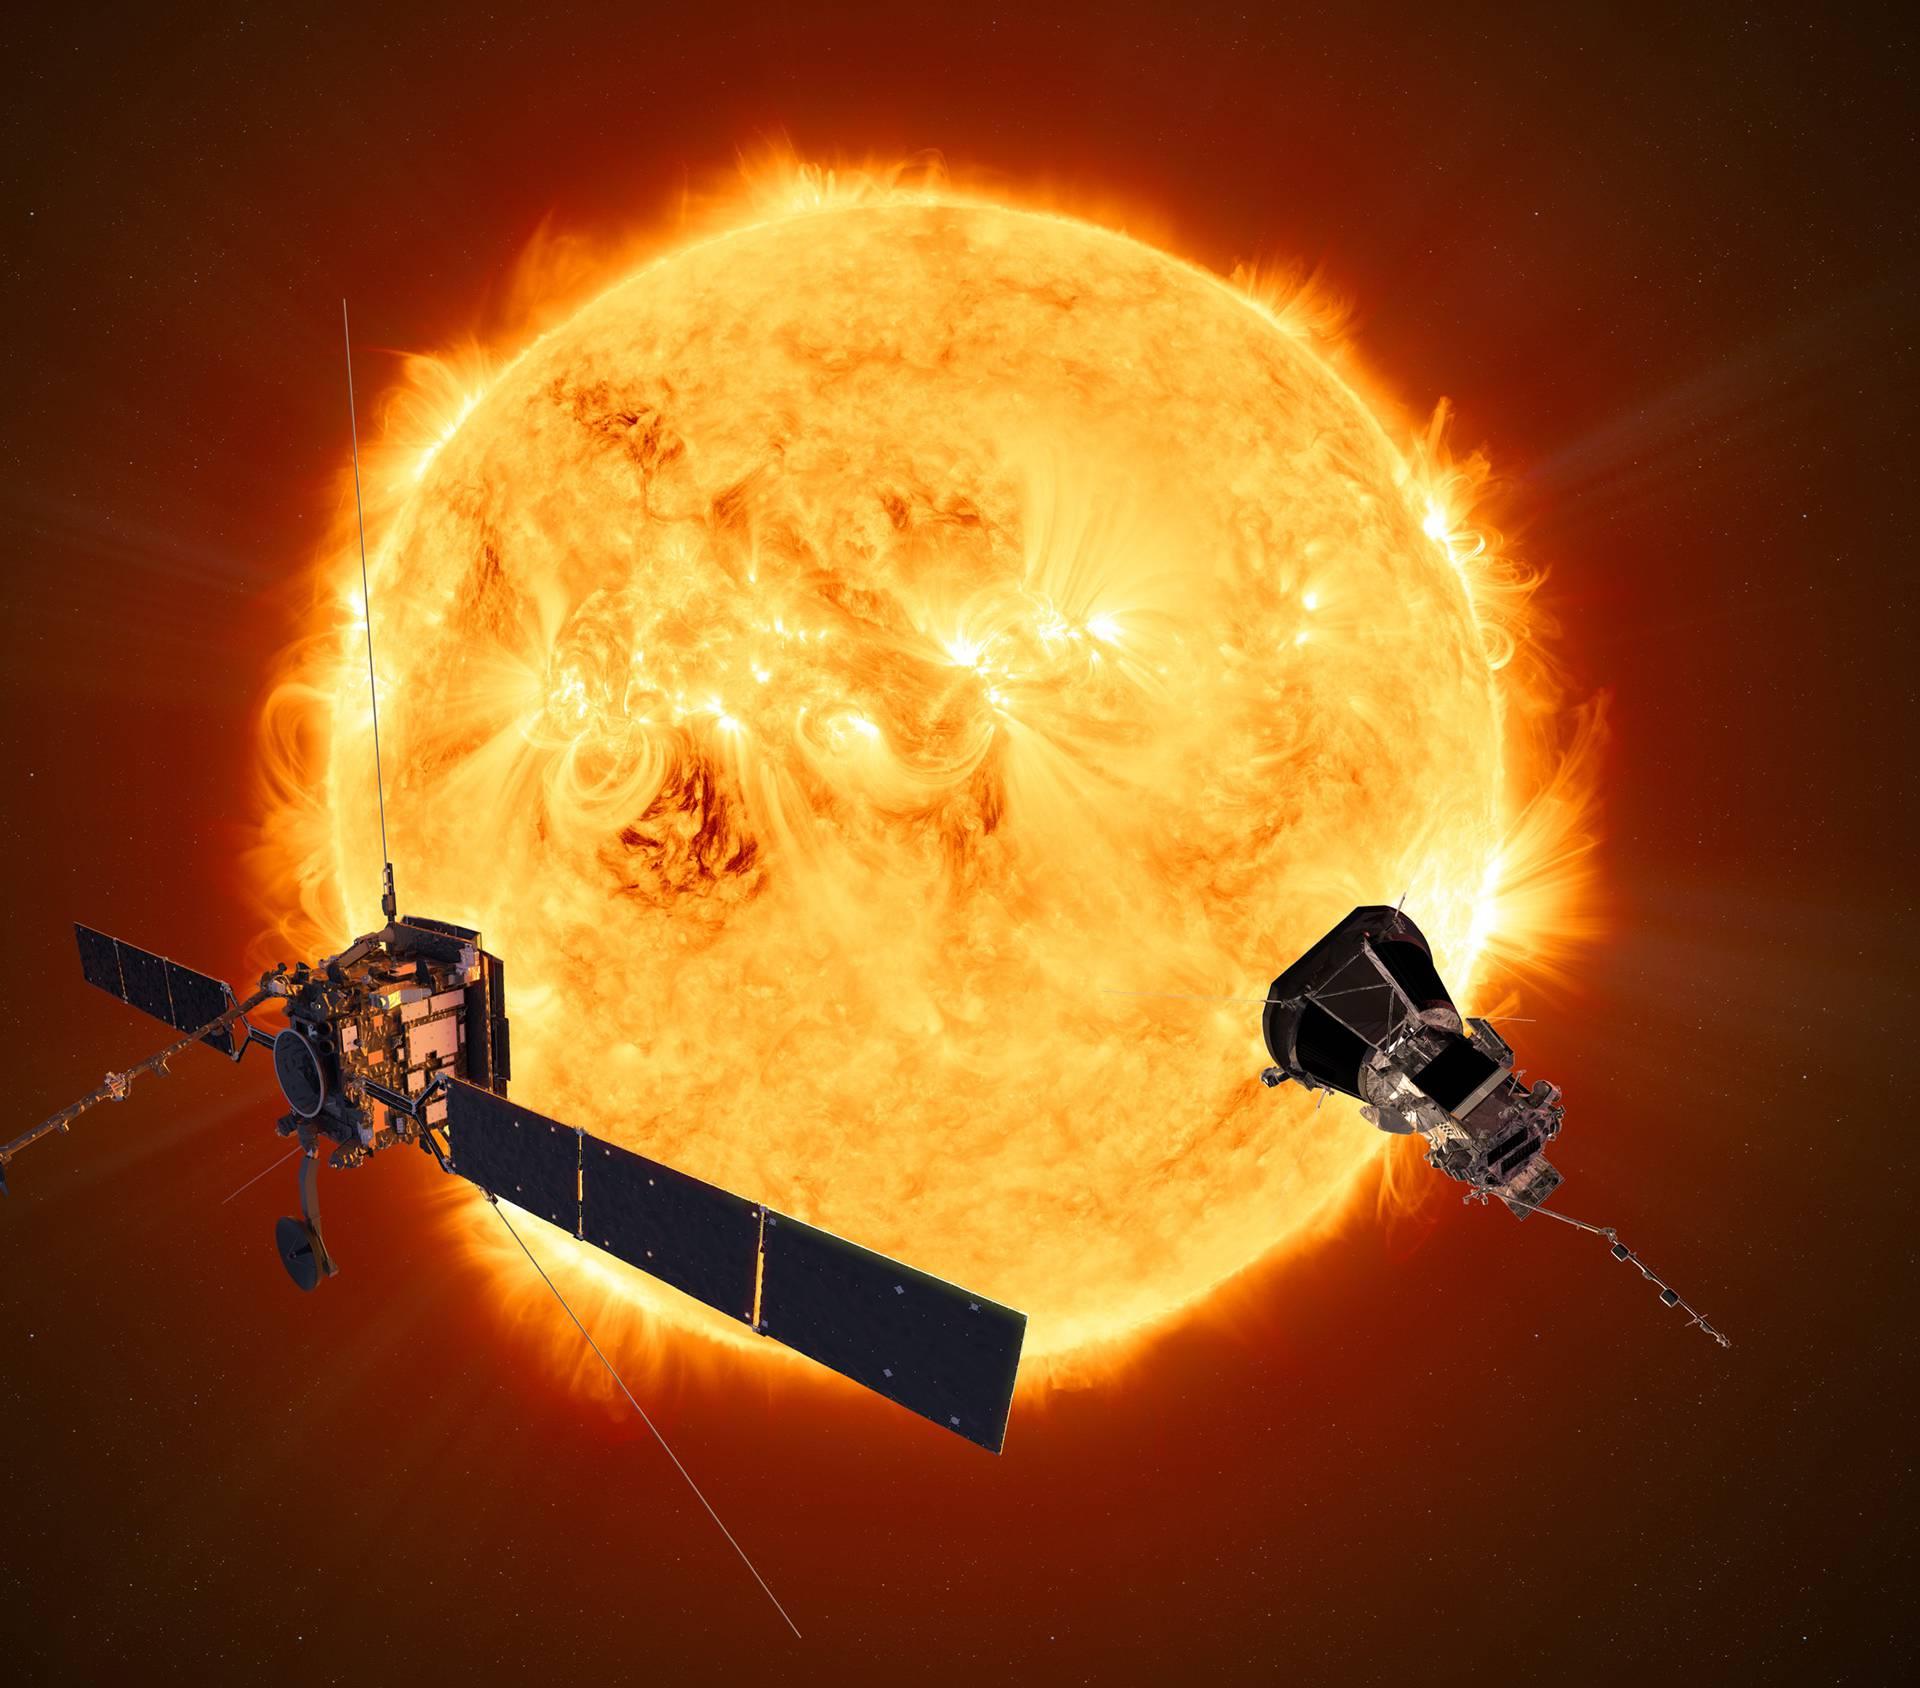 """Predivna slika"": Nova sonda dat će najbolji pogled na Sunce"